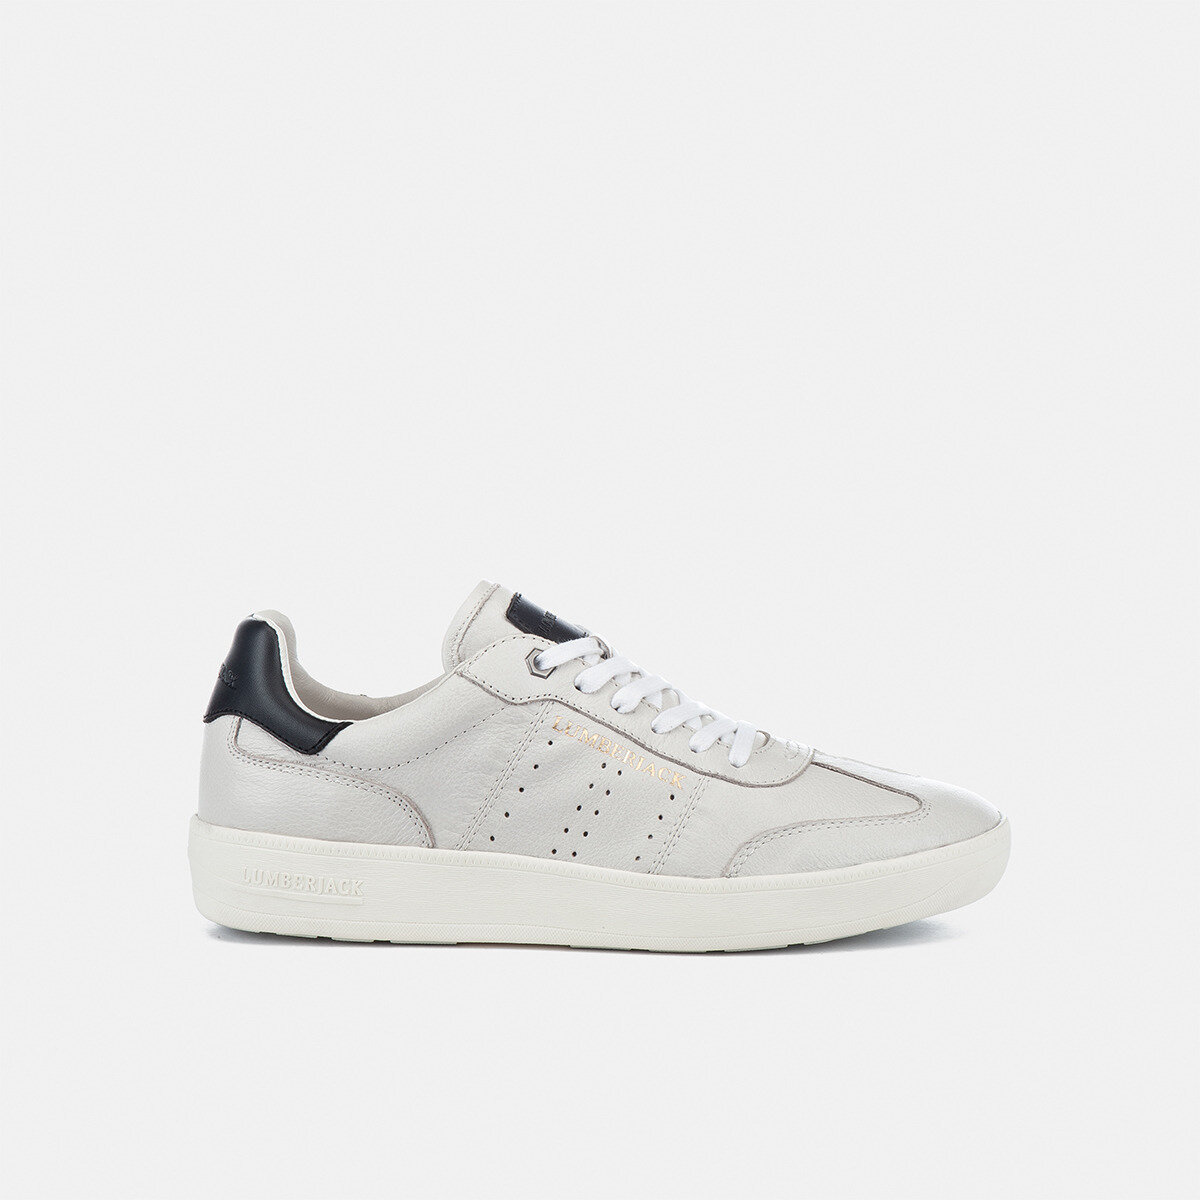 SUMMER CHUCK WHITE/BLACK Man Sneakers